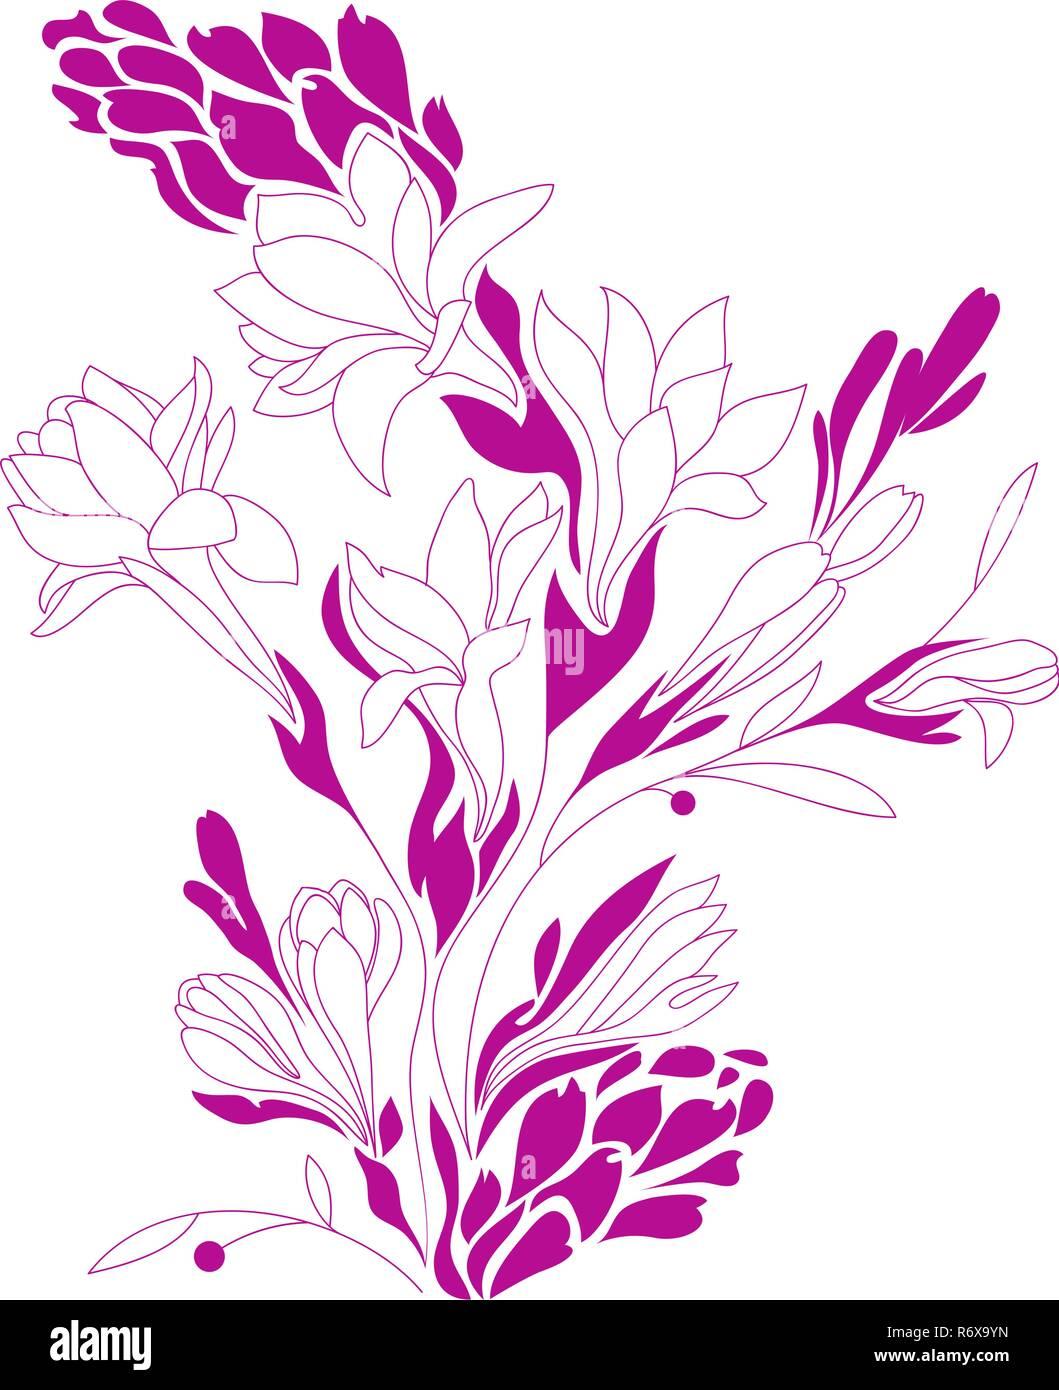 Flowers contour drawing, silhouette floral, Tuberose design, vector illustration - Stock Vector